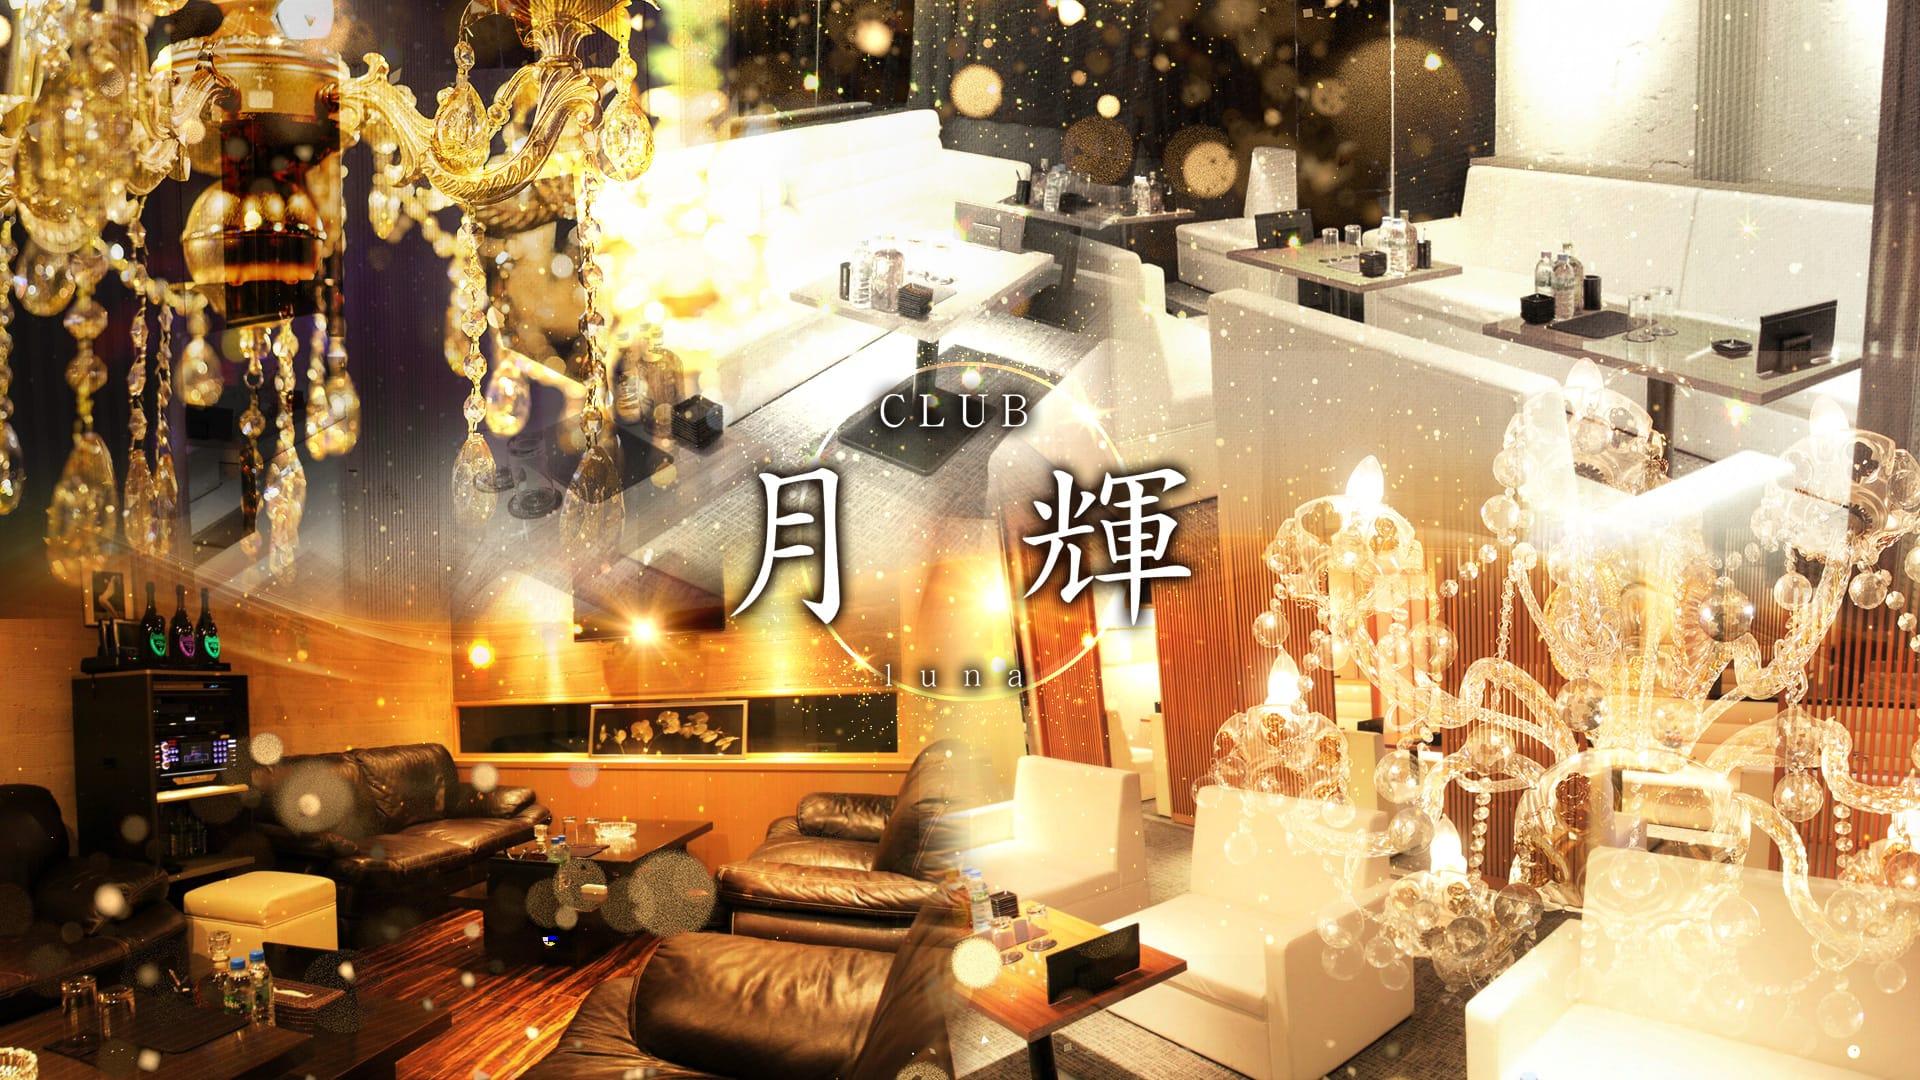 CLUB 月輝(ルナ)【公式求人・体入情報】 片町キャバクラ TOP画像